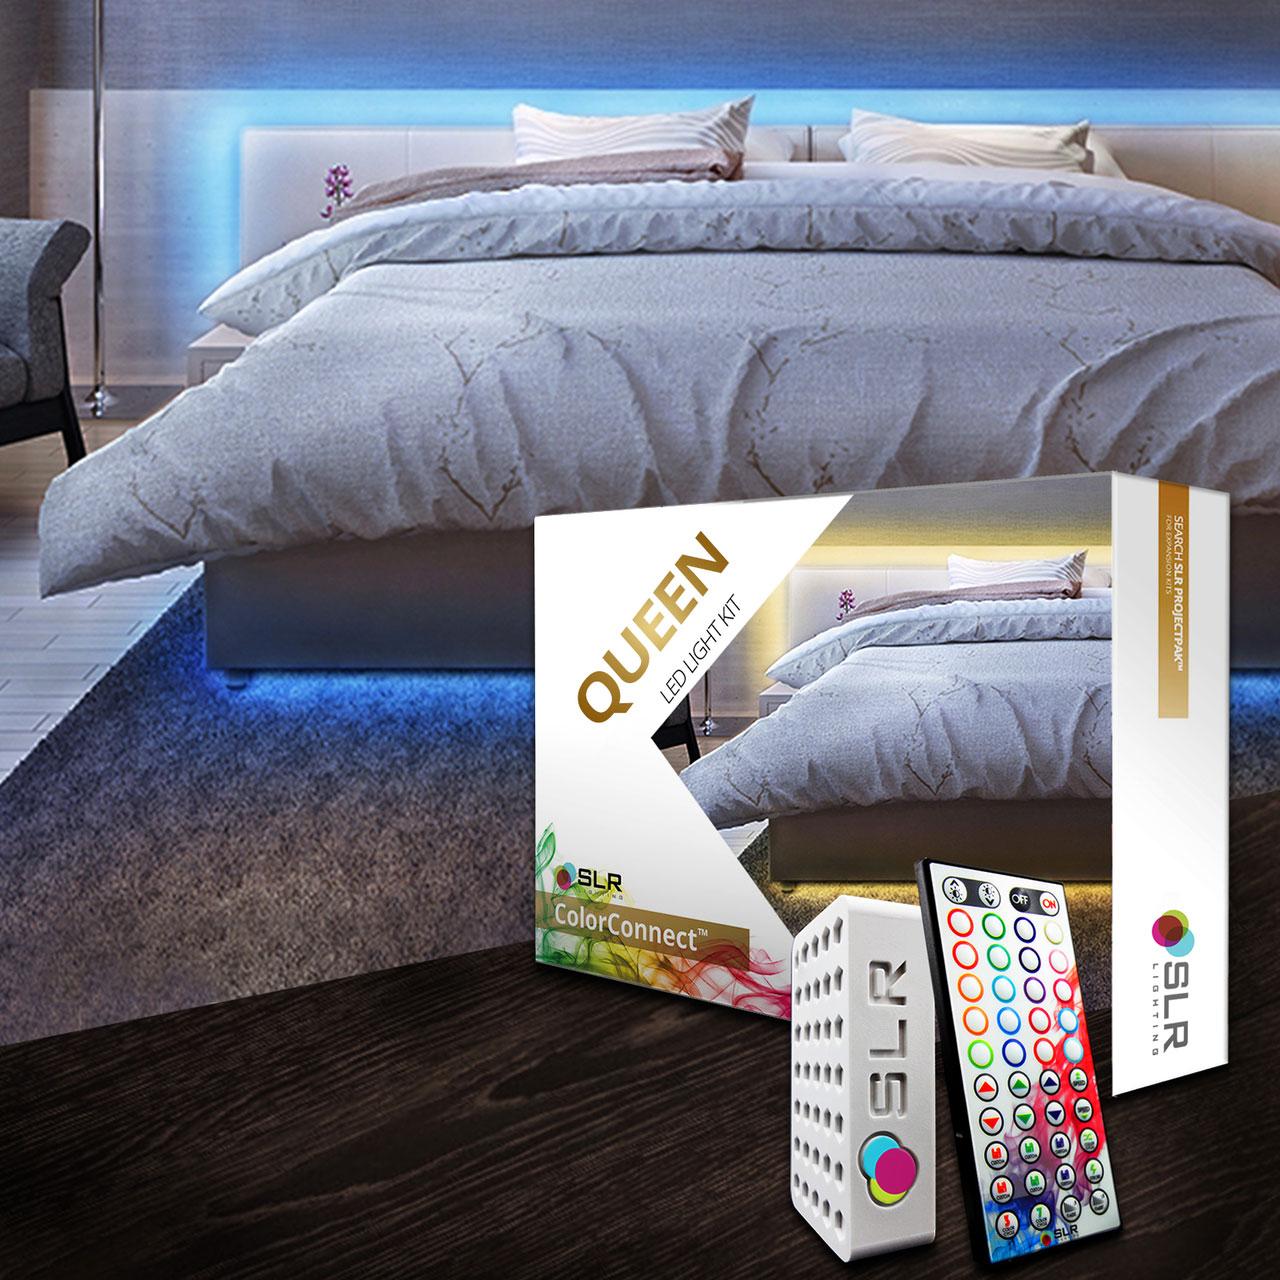 Bed Lighting Kit - Multi-Color LED Accent Lights For Under Bed & Headboards